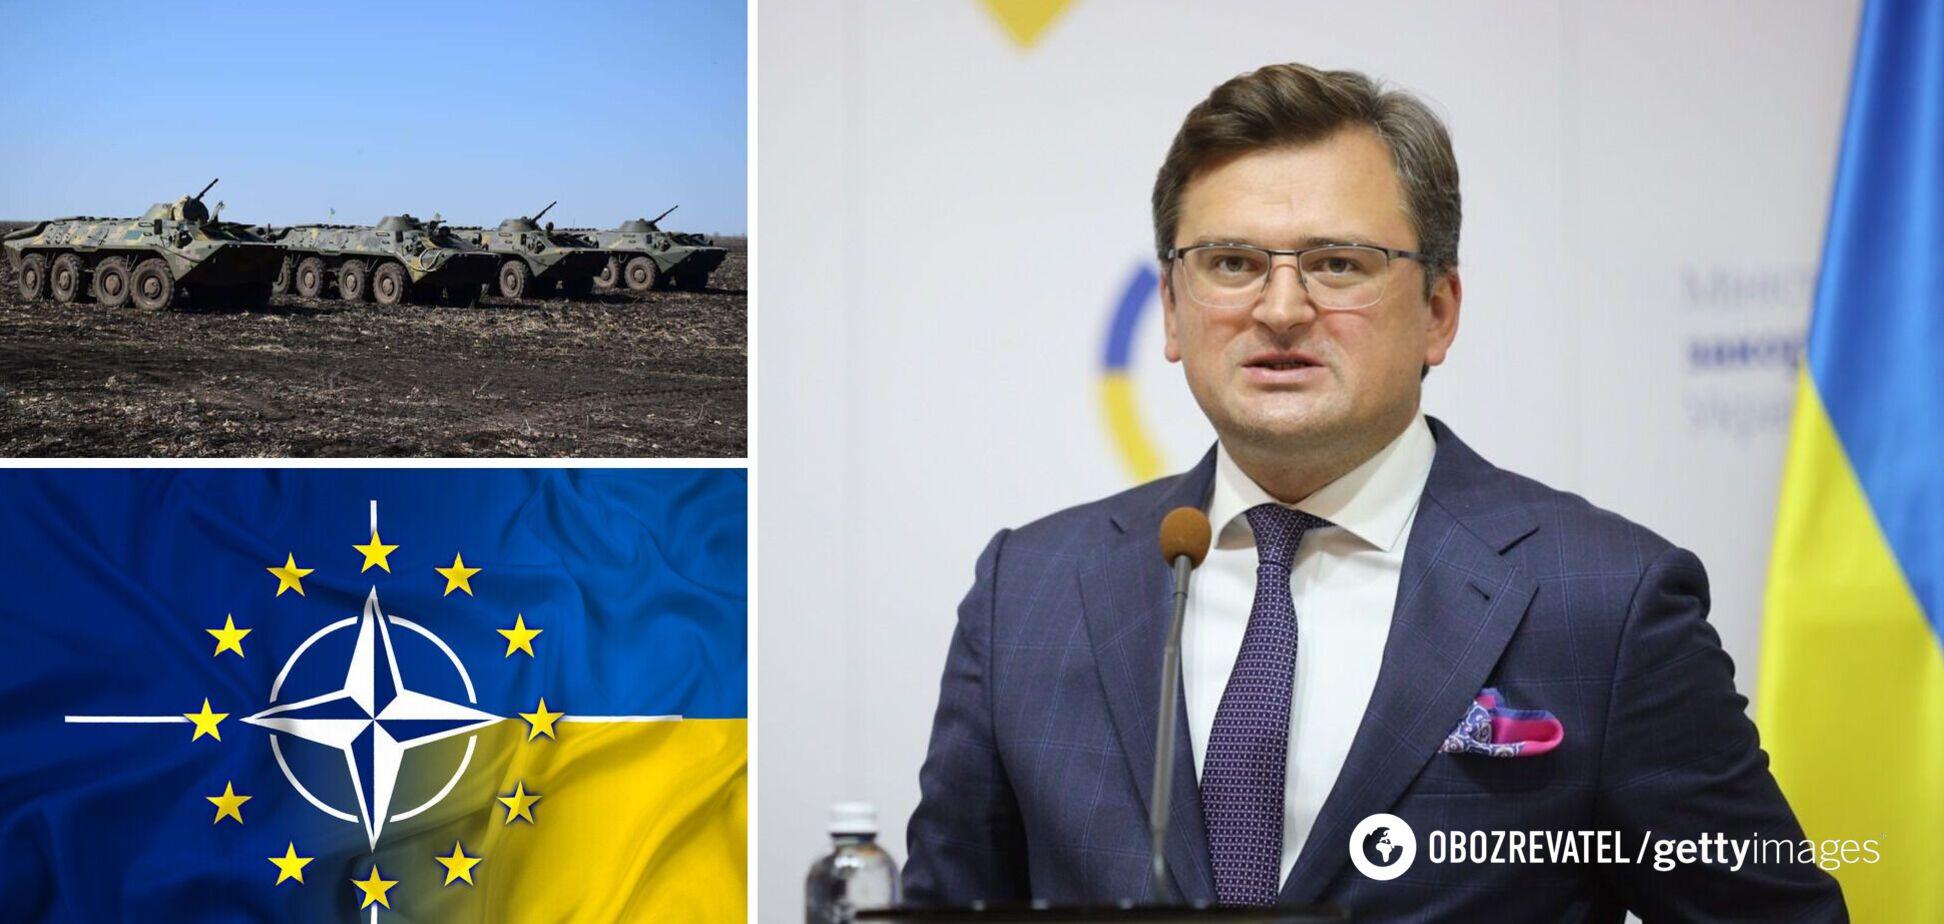 Кулеба: Україна не планує наступу на Донбас, а РФ стягнула війська за трьома напрямками